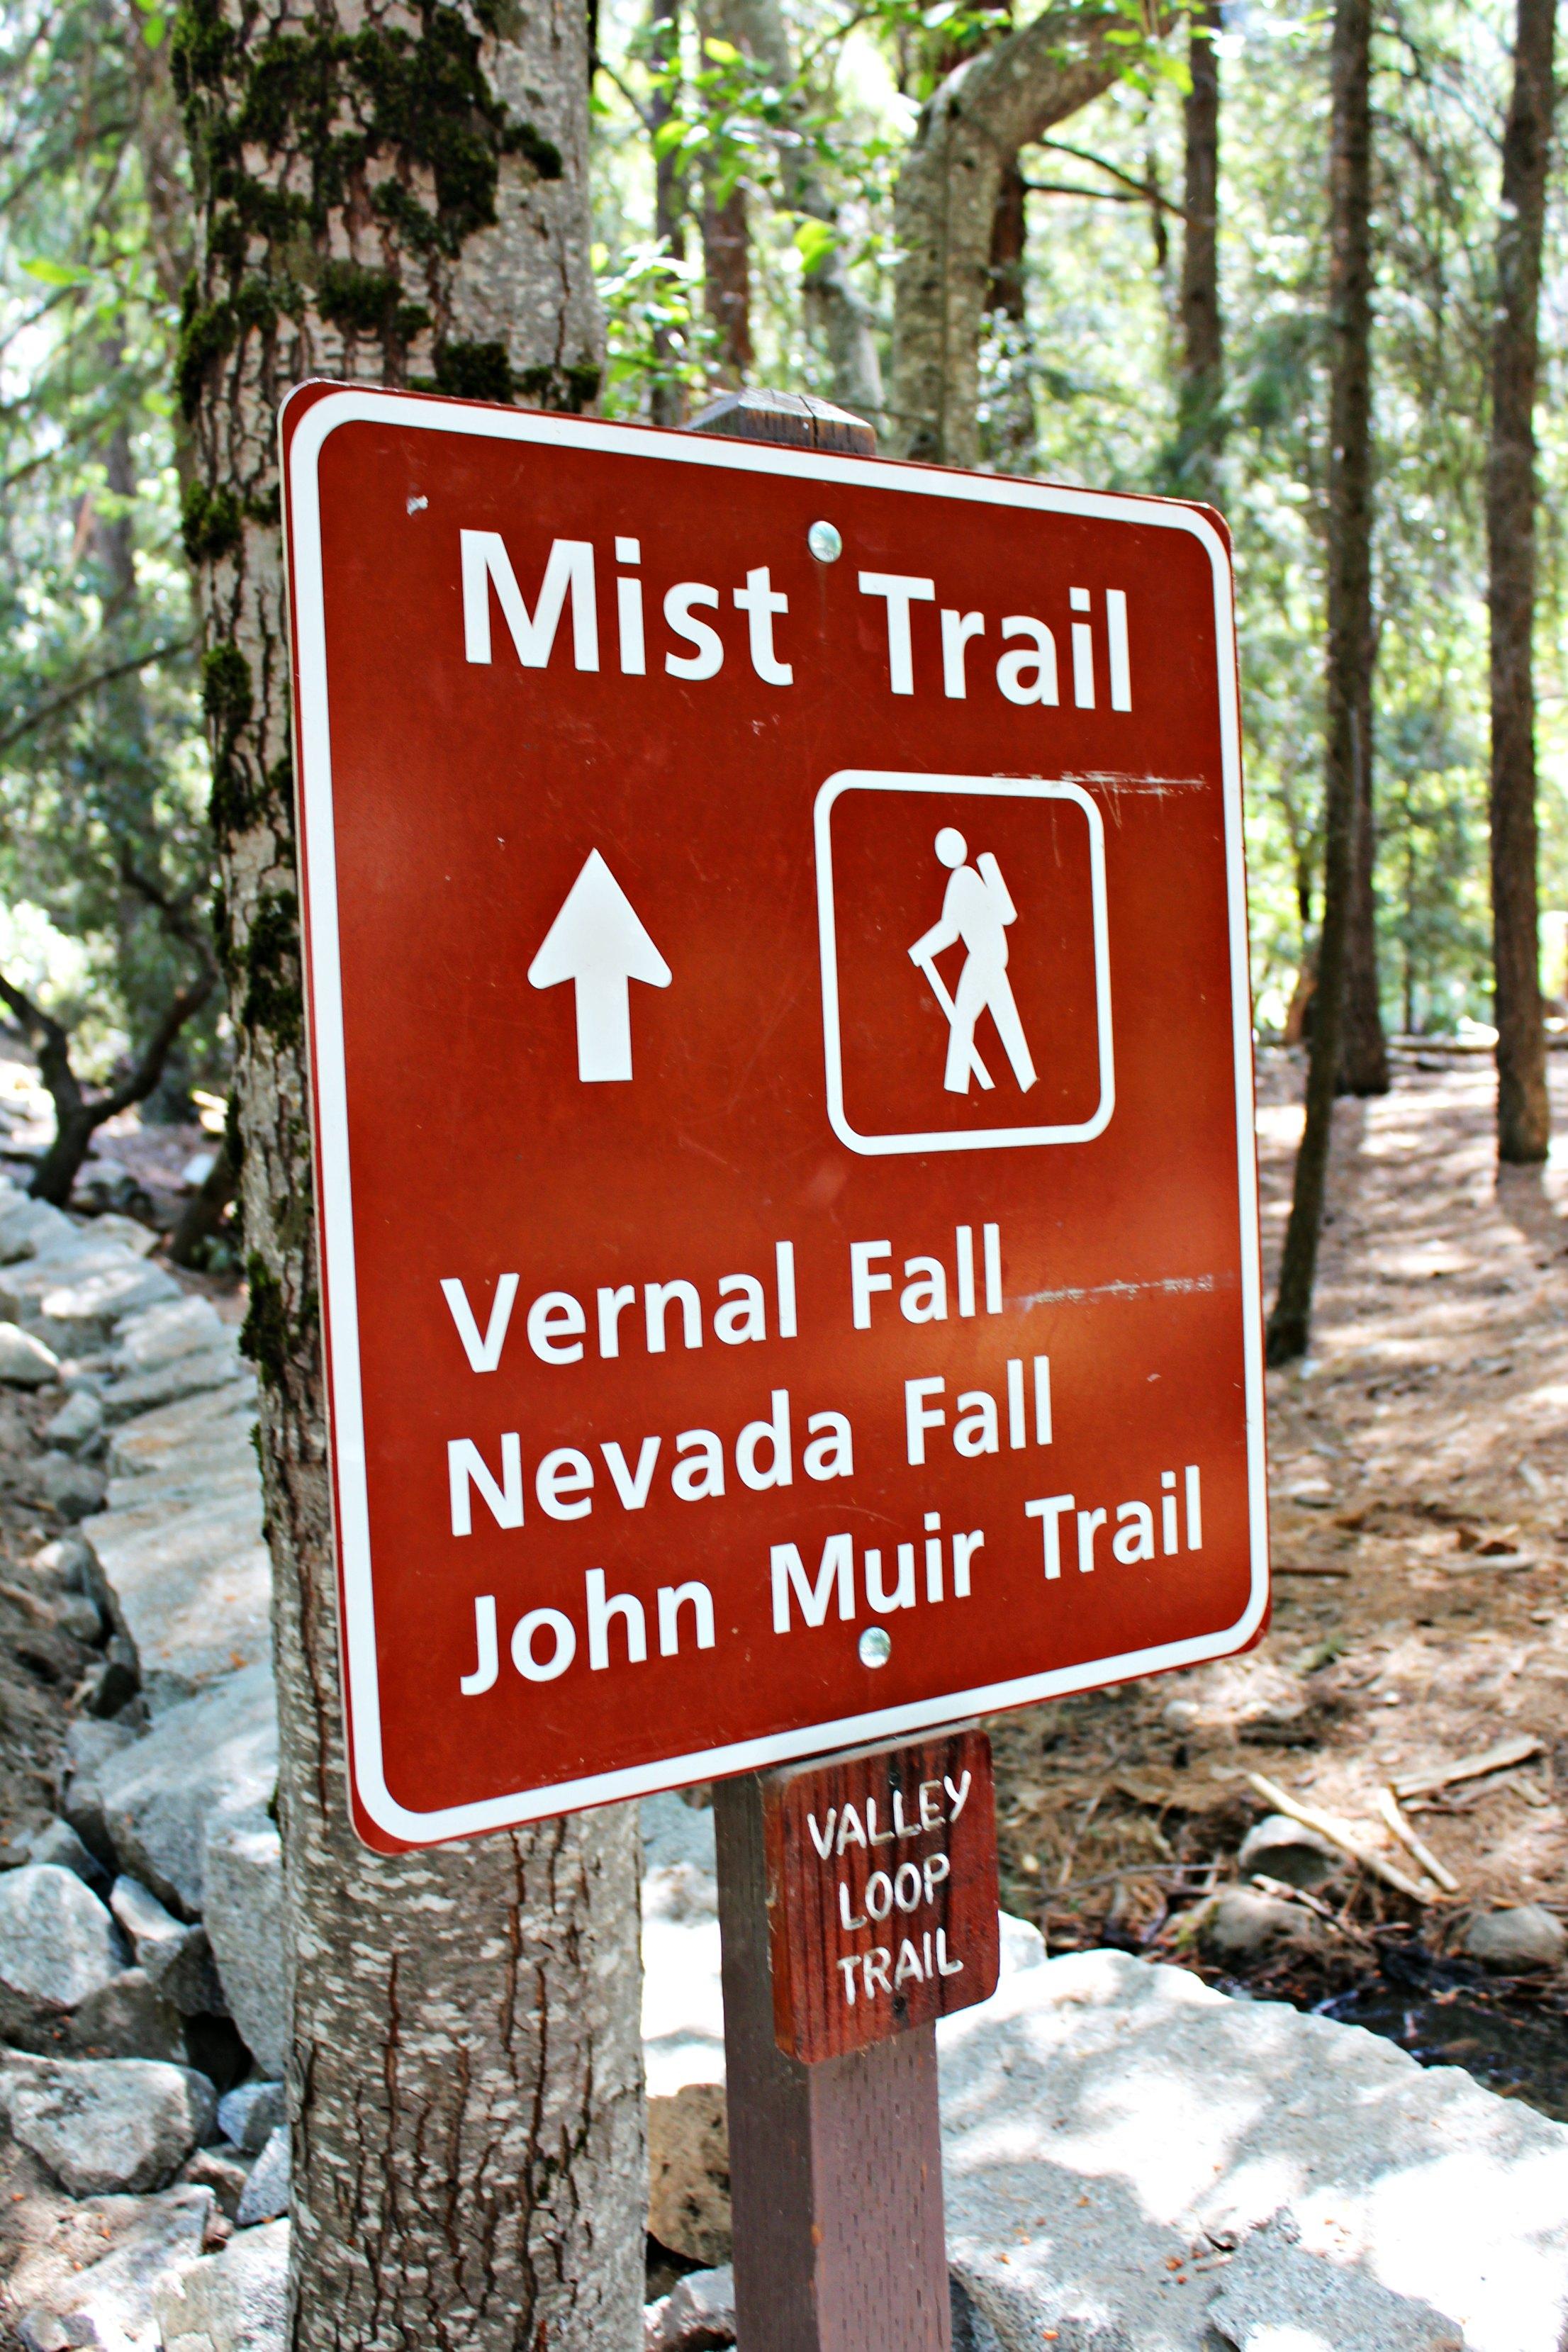 mist-trail-vernal-nevada-john-muir-sign